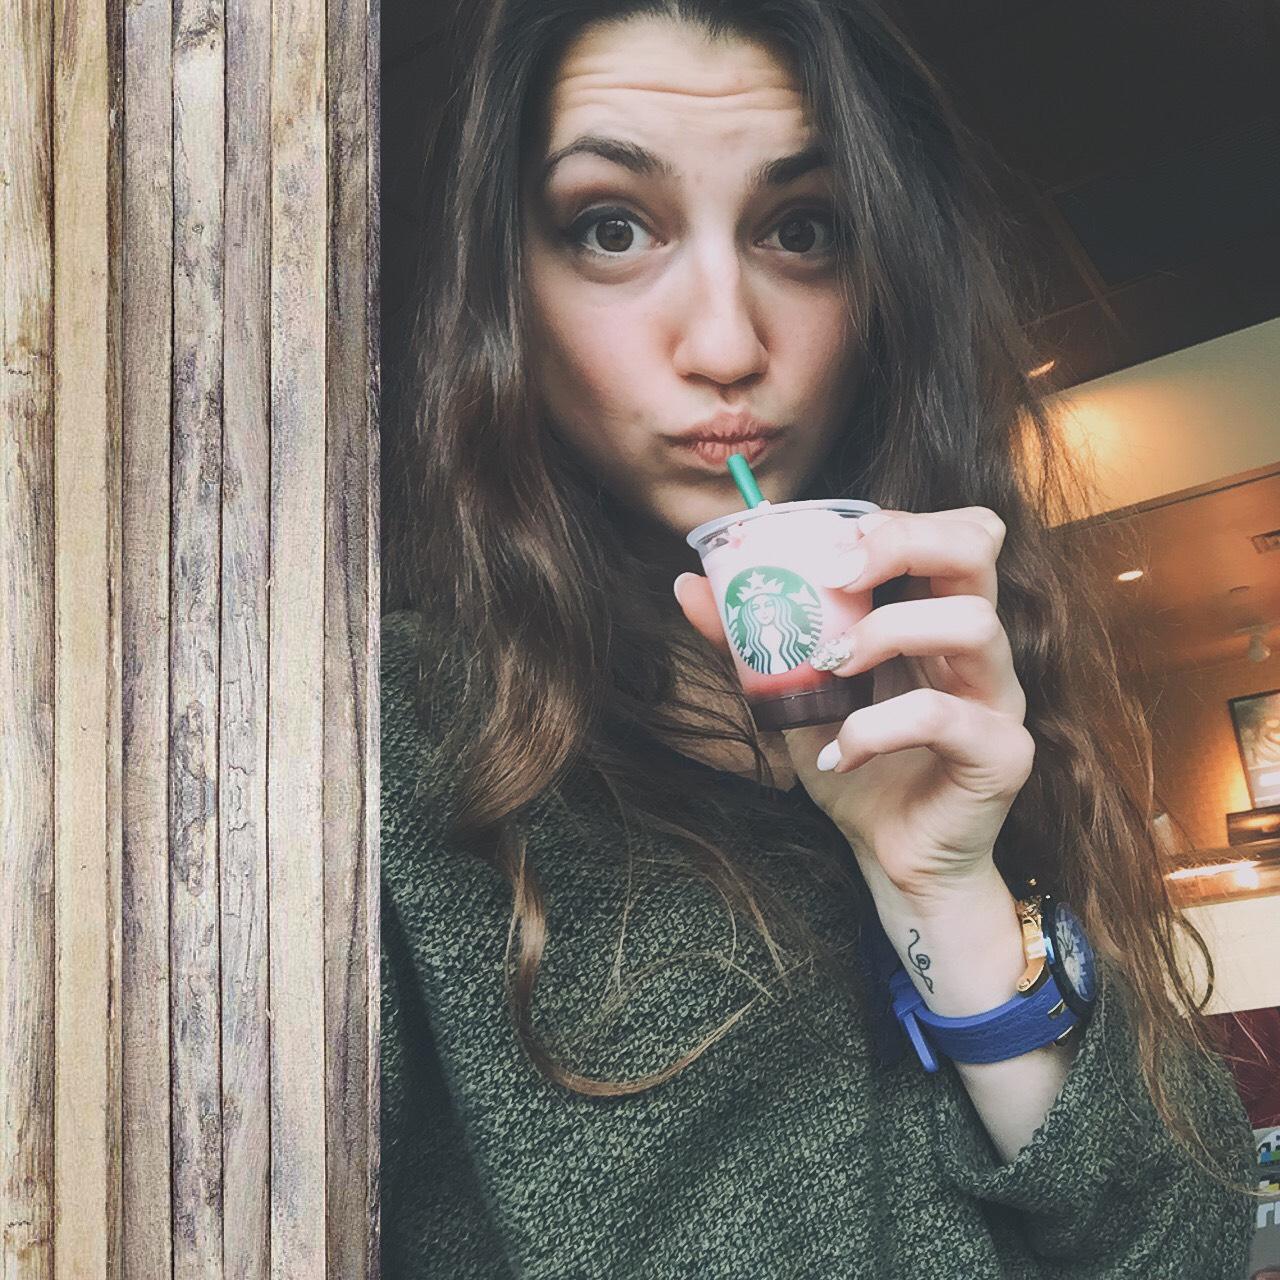 CAPAStudyAbroad_Sydney_Fall2017_From Hanna Okhrimchuk - Working on Campus at Starbucks.jpg